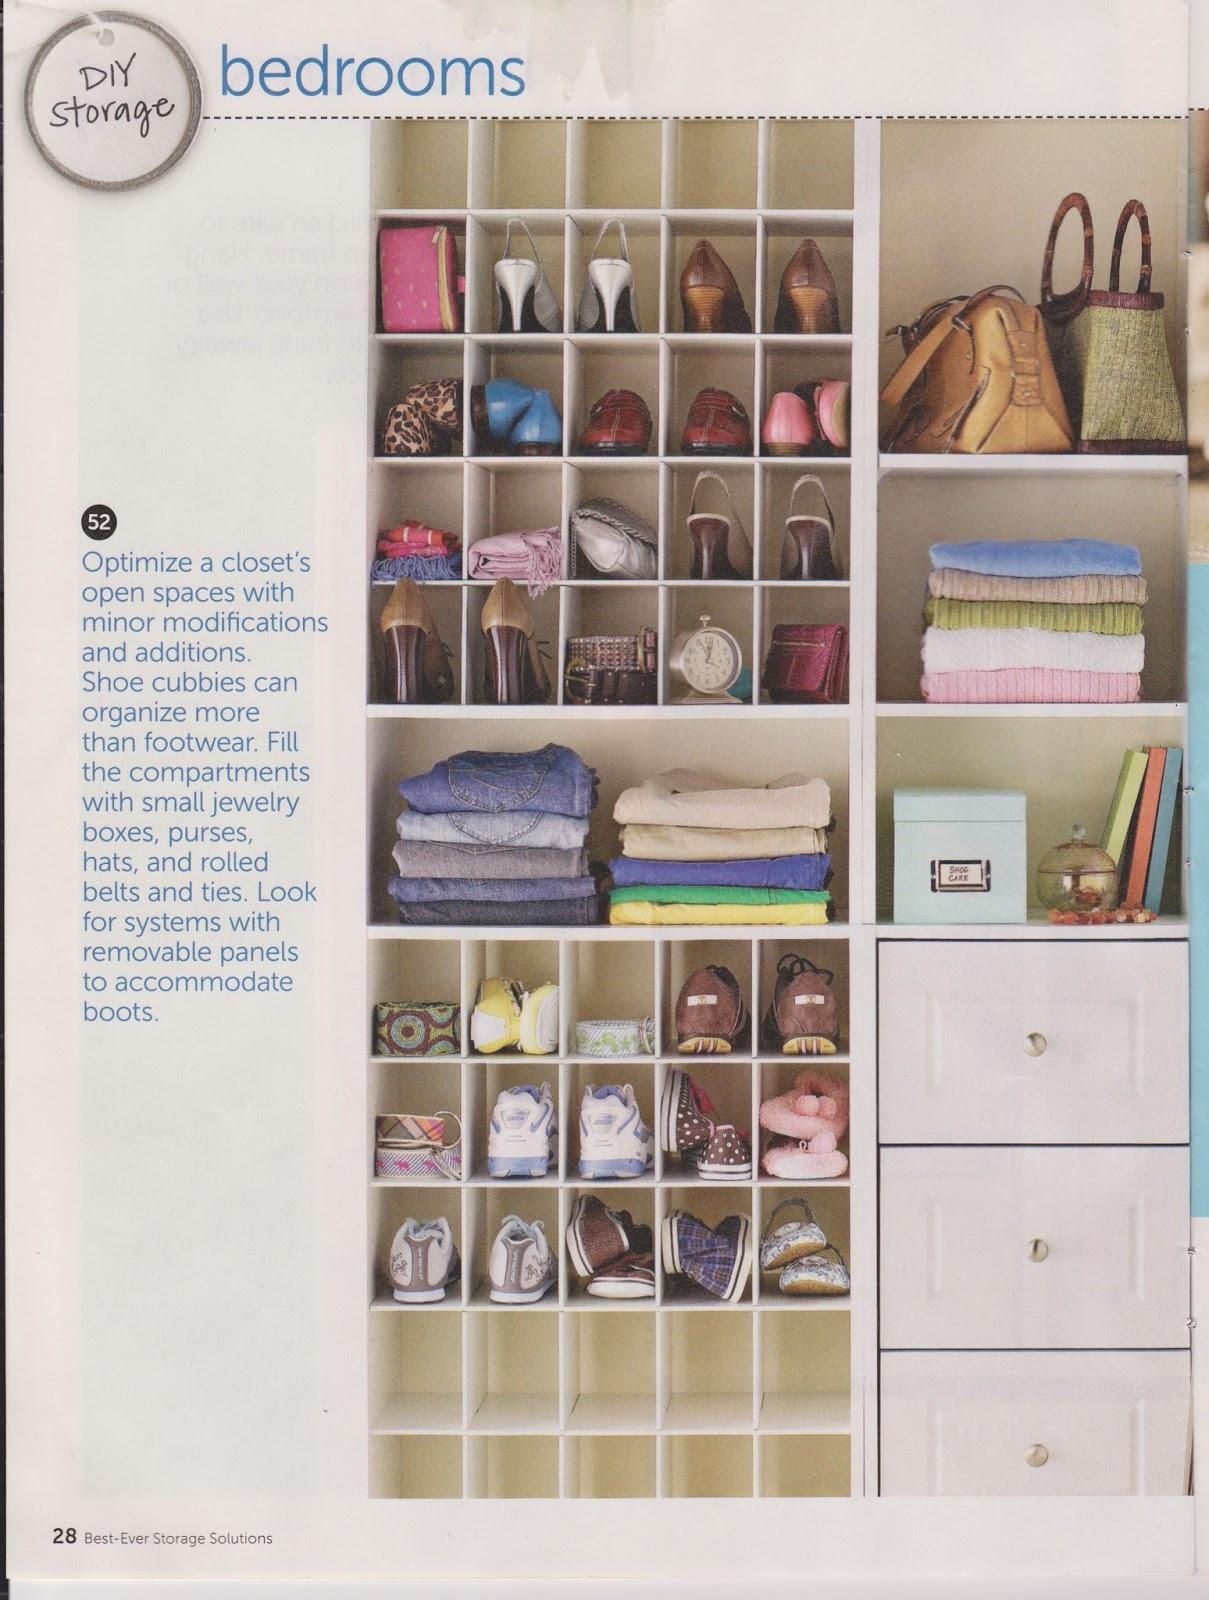 Erika39s Chiquis Diy Bedroom Storage Solutions